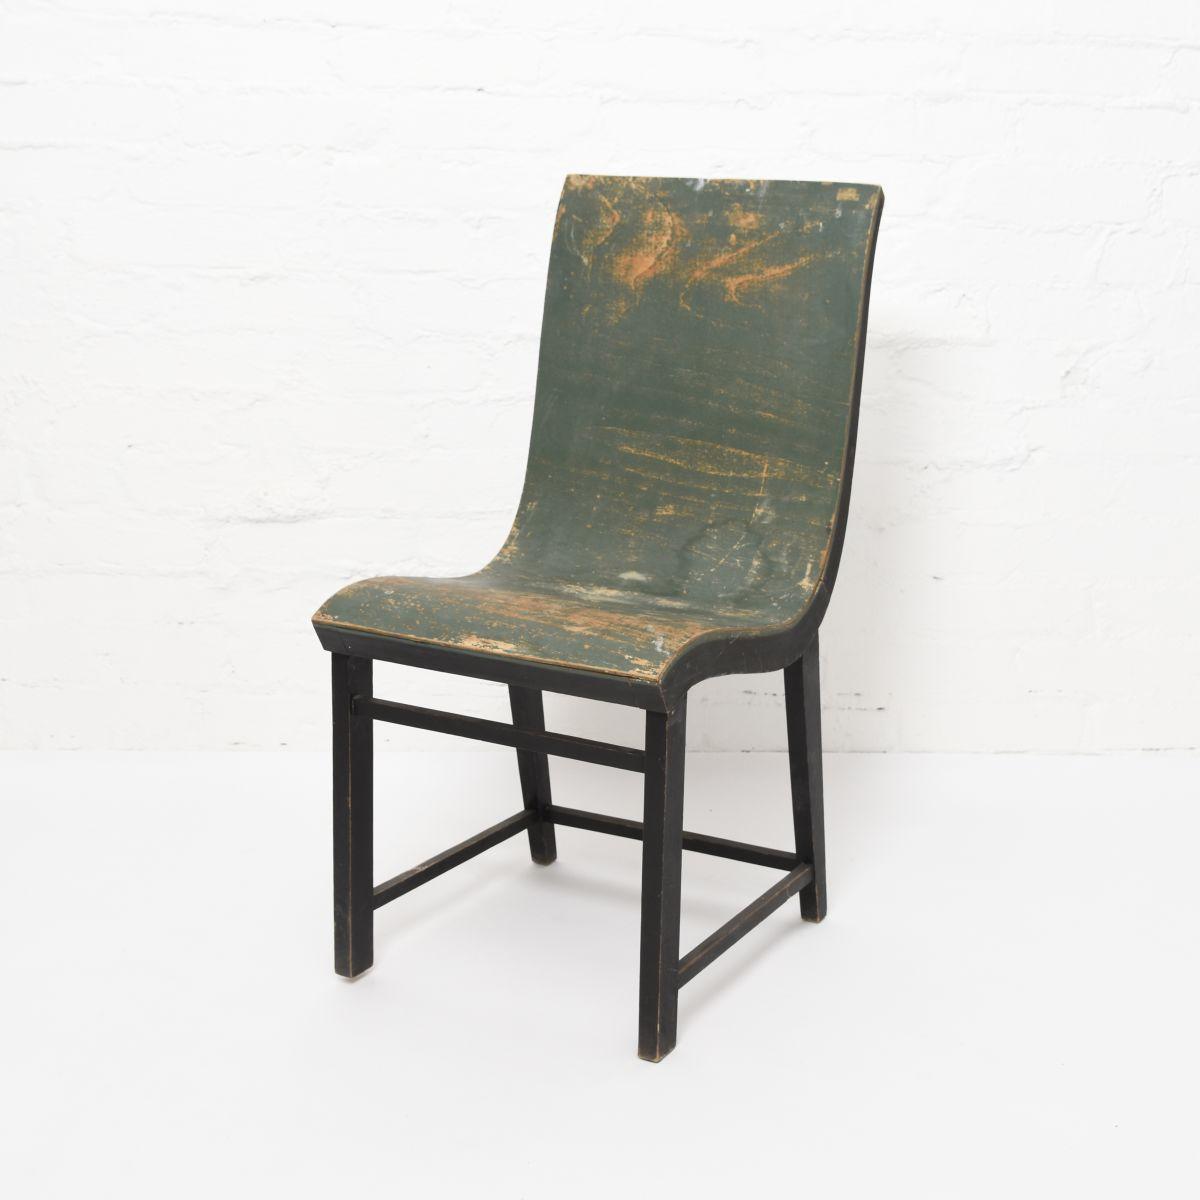 Toivonen-Eevert-Plywood-Chair-Green-Paint